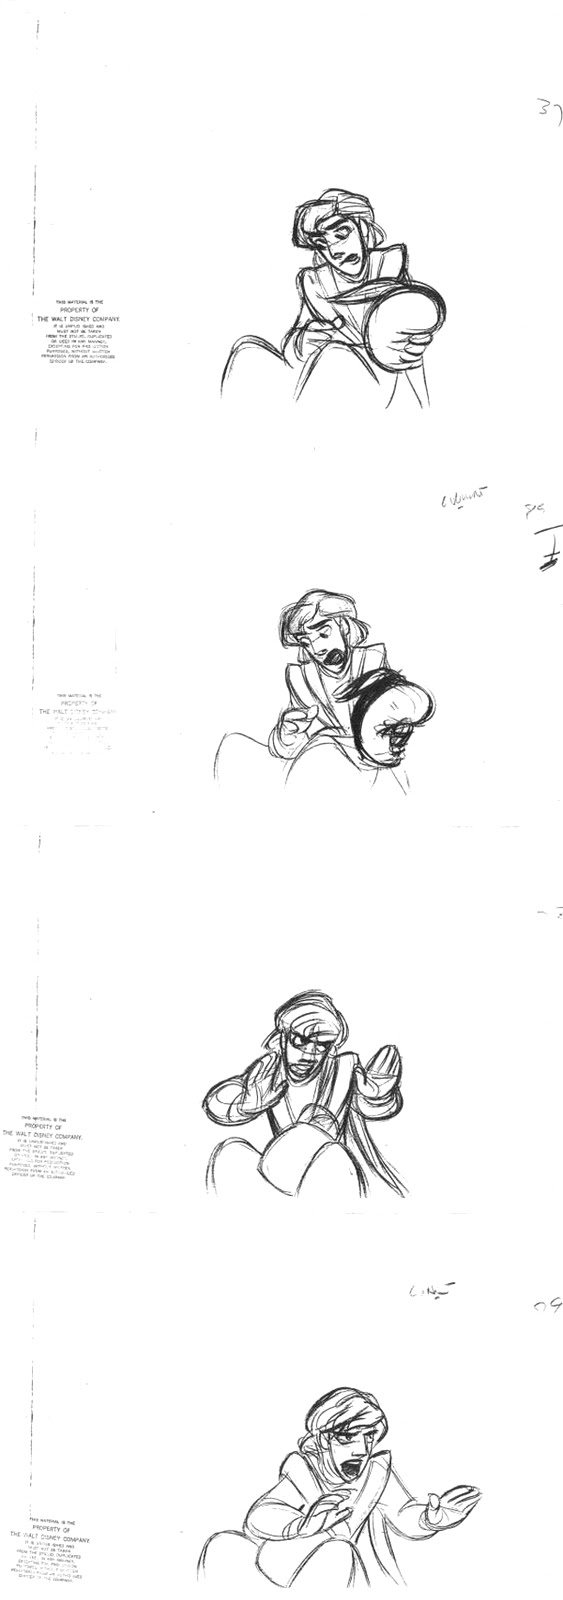 aladdin_disney_production_drawings_aladdin_002 (1).jpg